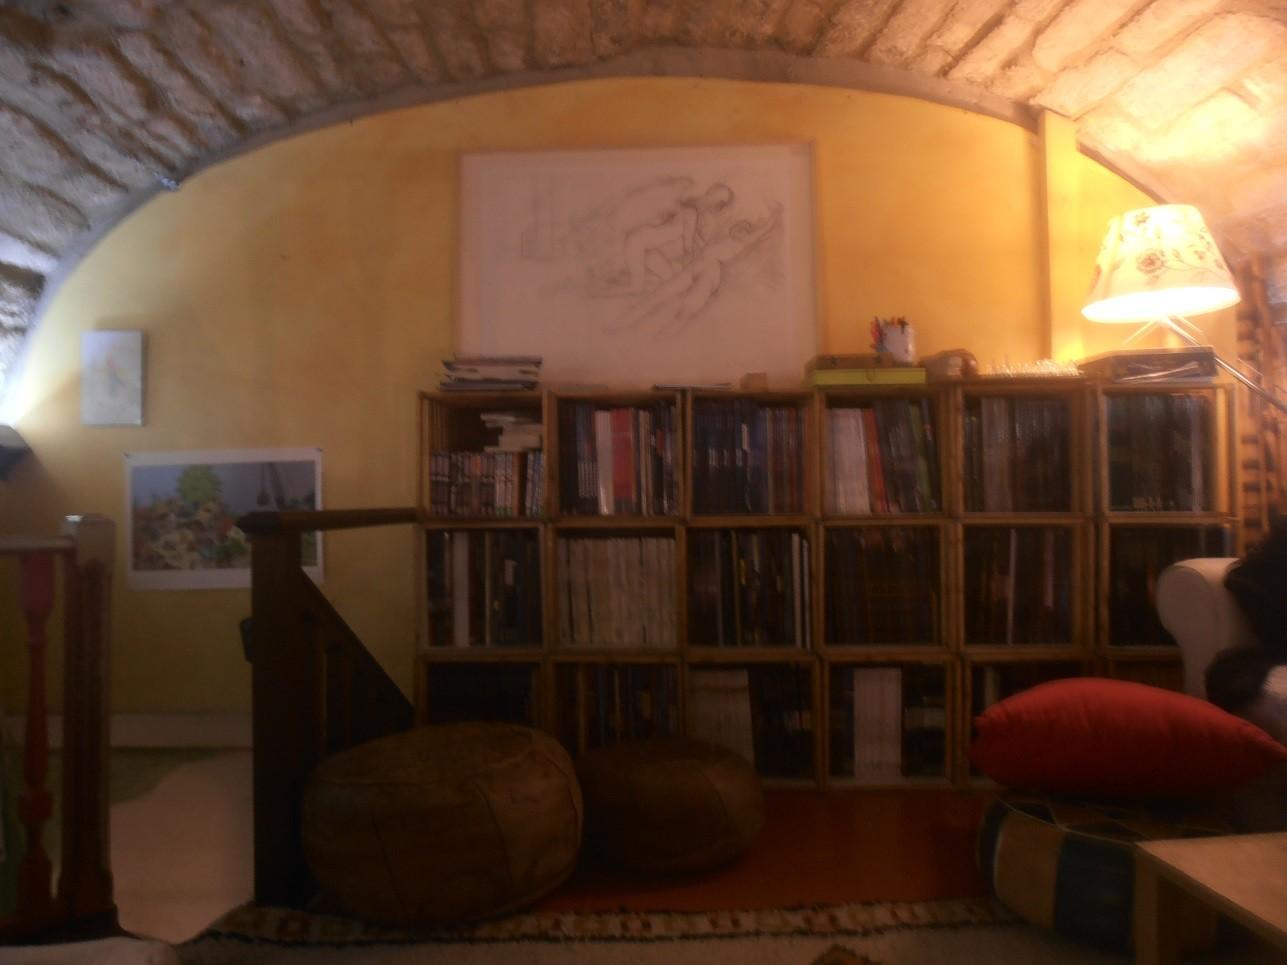 la mezzanine un salon de th part. Black Bedroom Furniture Sets. Home Design Ideas